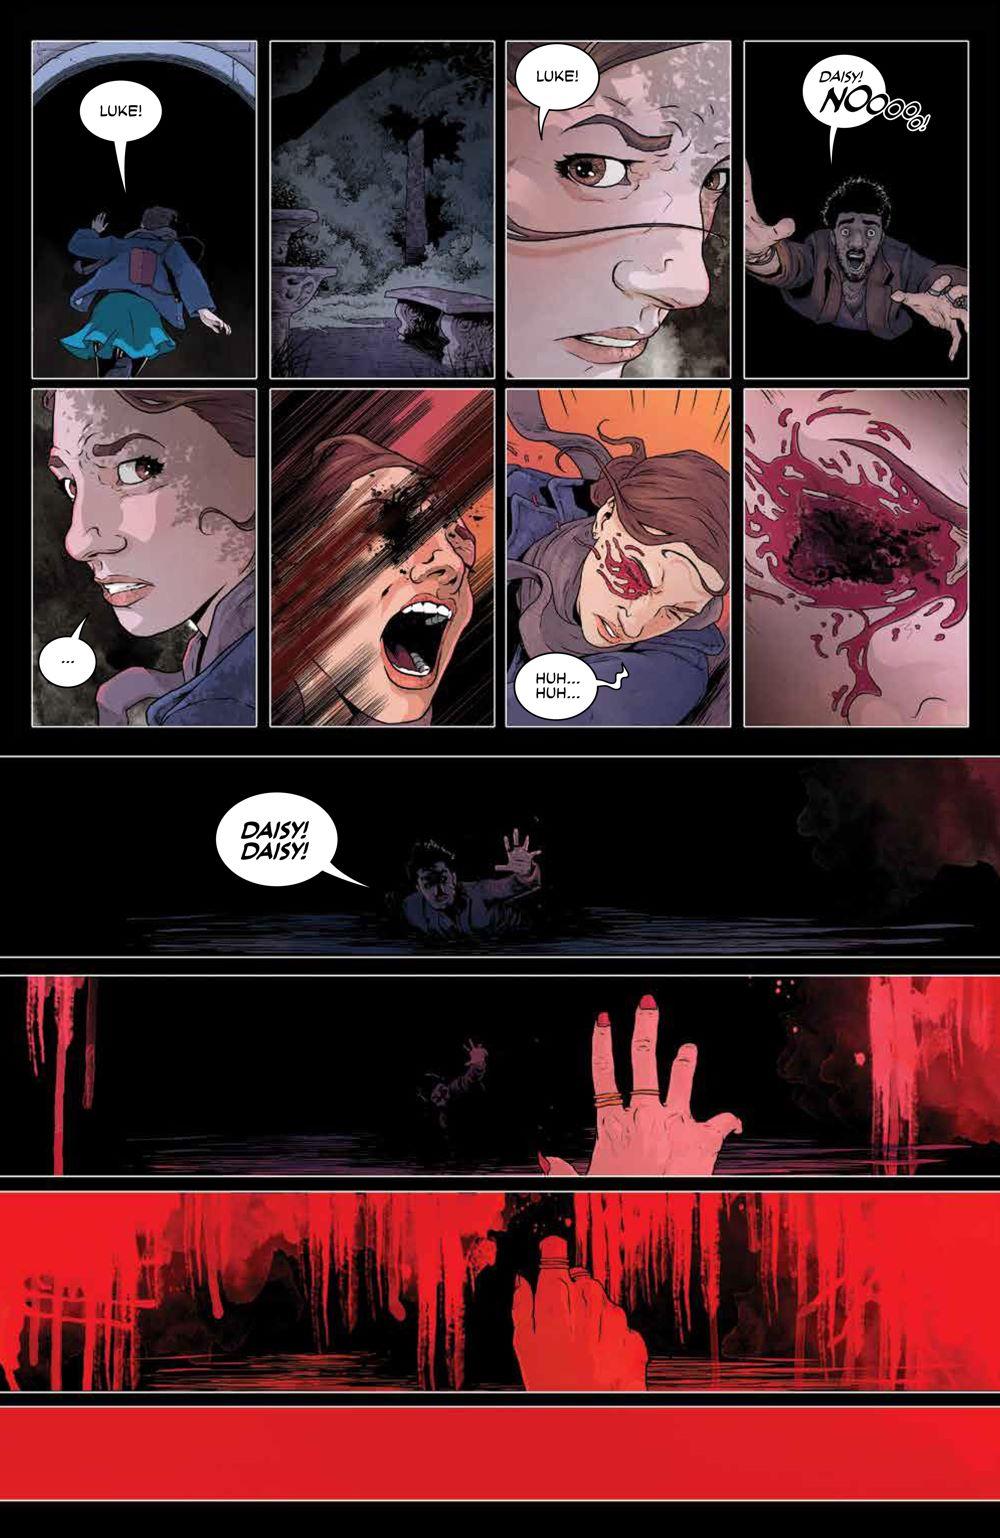 RedMother_v1_SC_PRESS_13 ComicList Previews: RED MOTHER VOLUME 1 TP